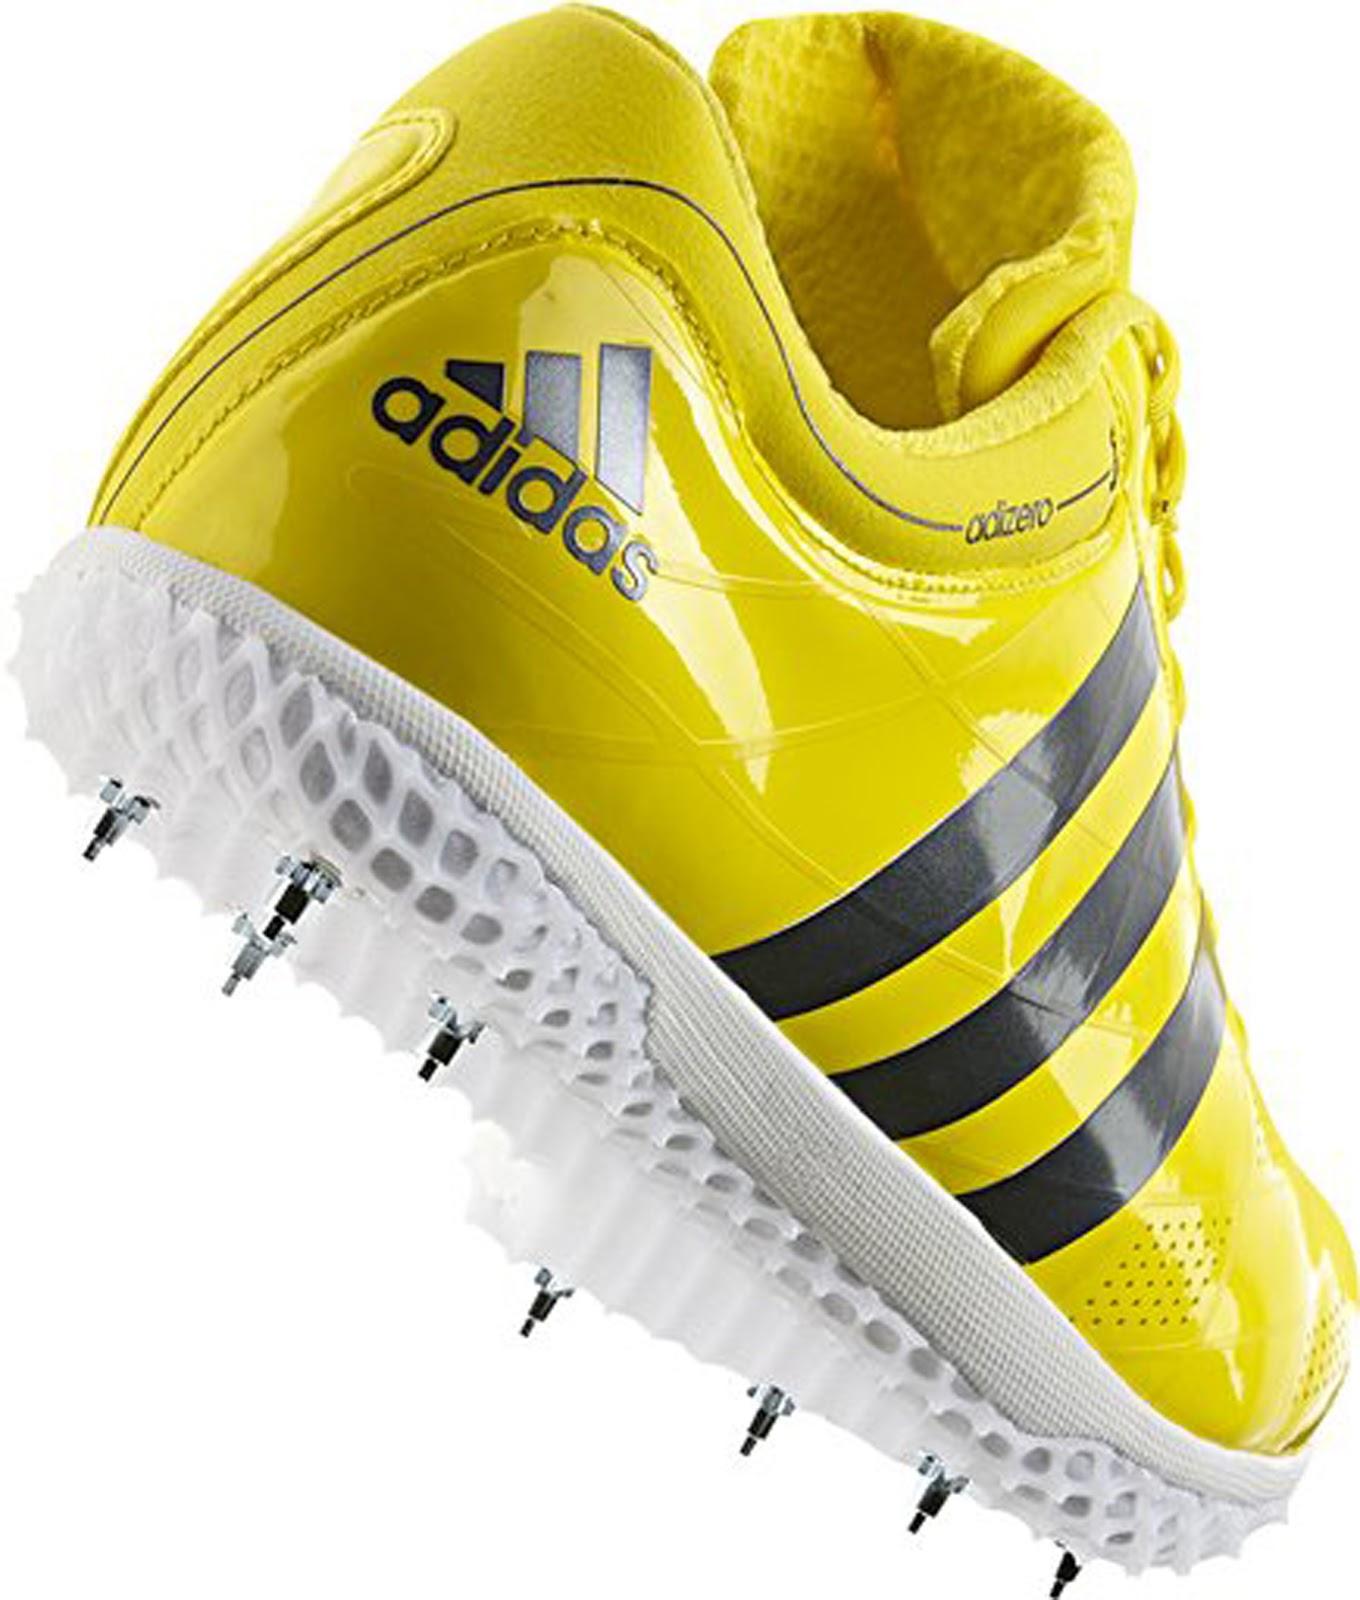 best website 9f761 154f7 adidas adizero hj flow spikes